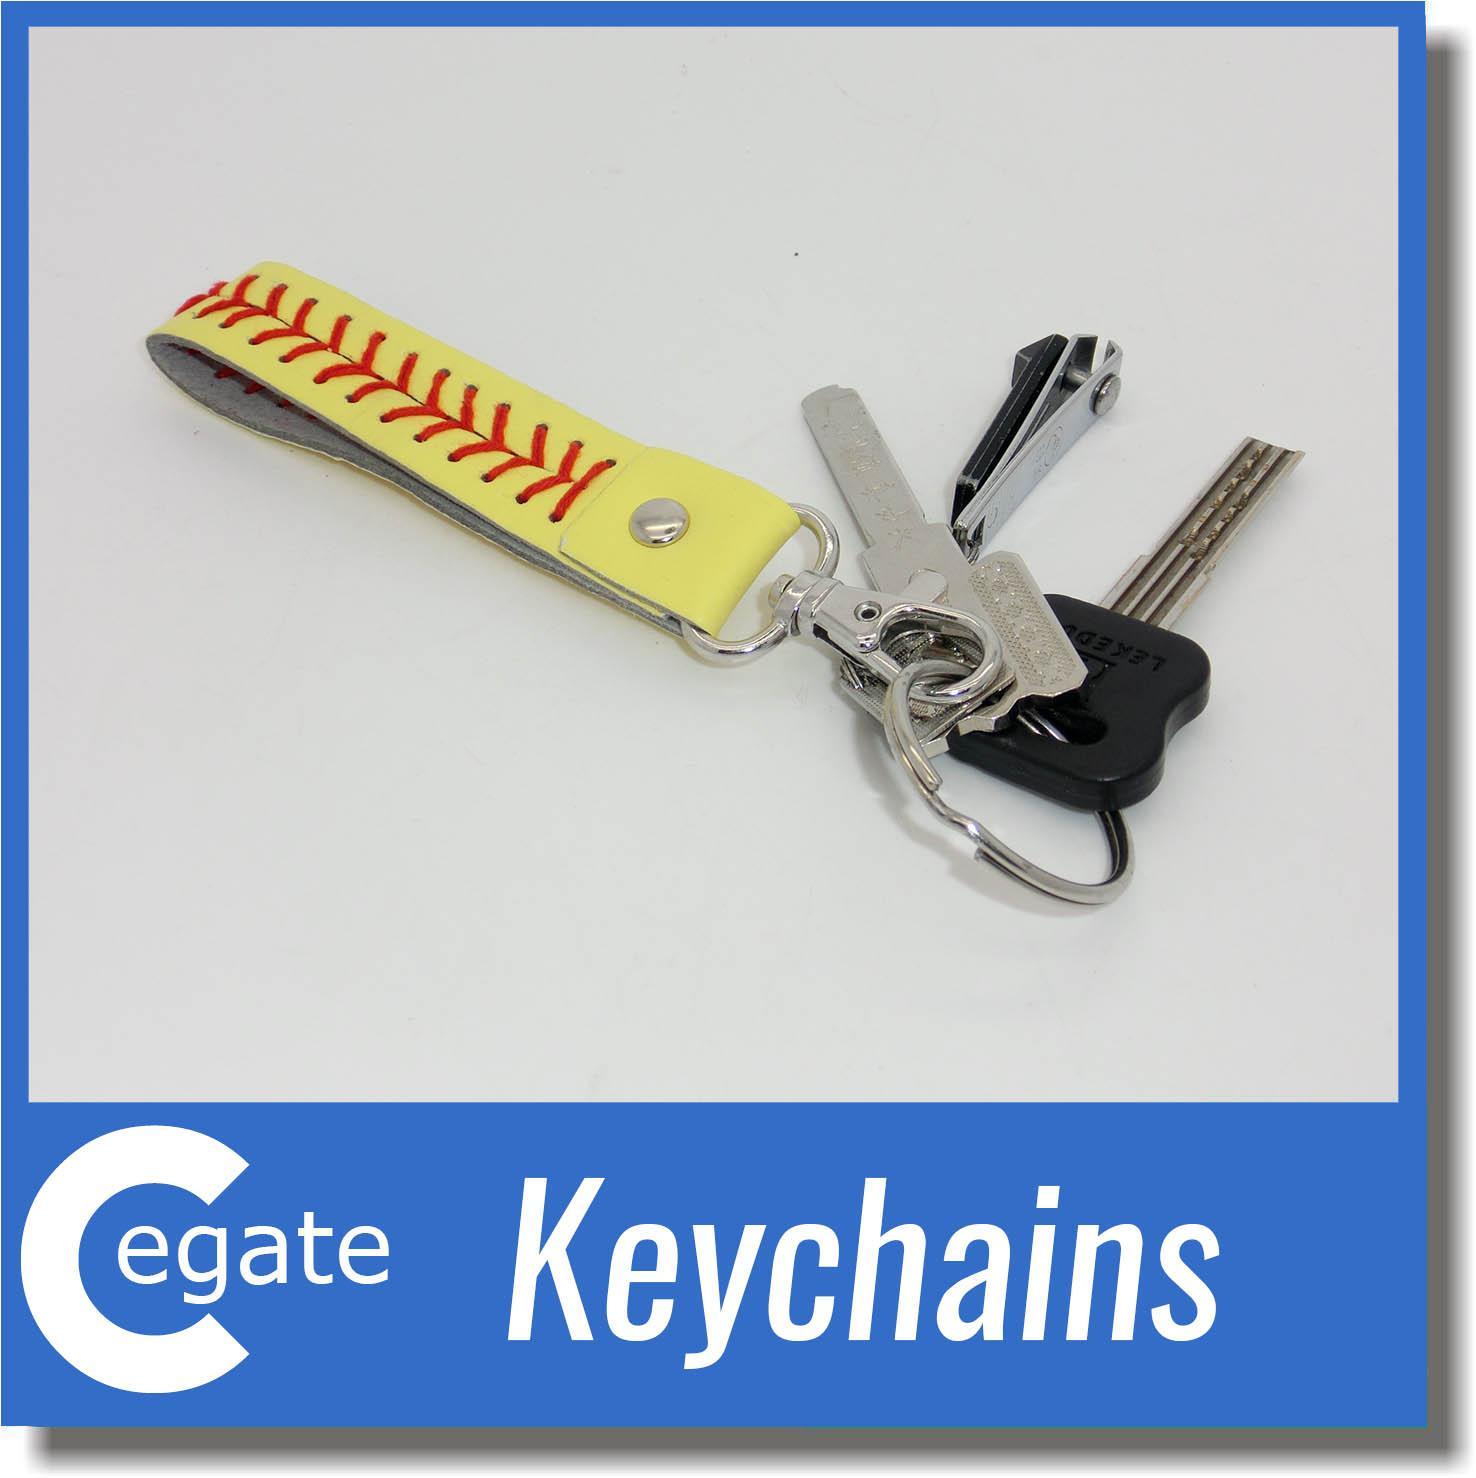 2016 baseball keychain,fastpitch softball accessories baseball seam keychains many colors free DH